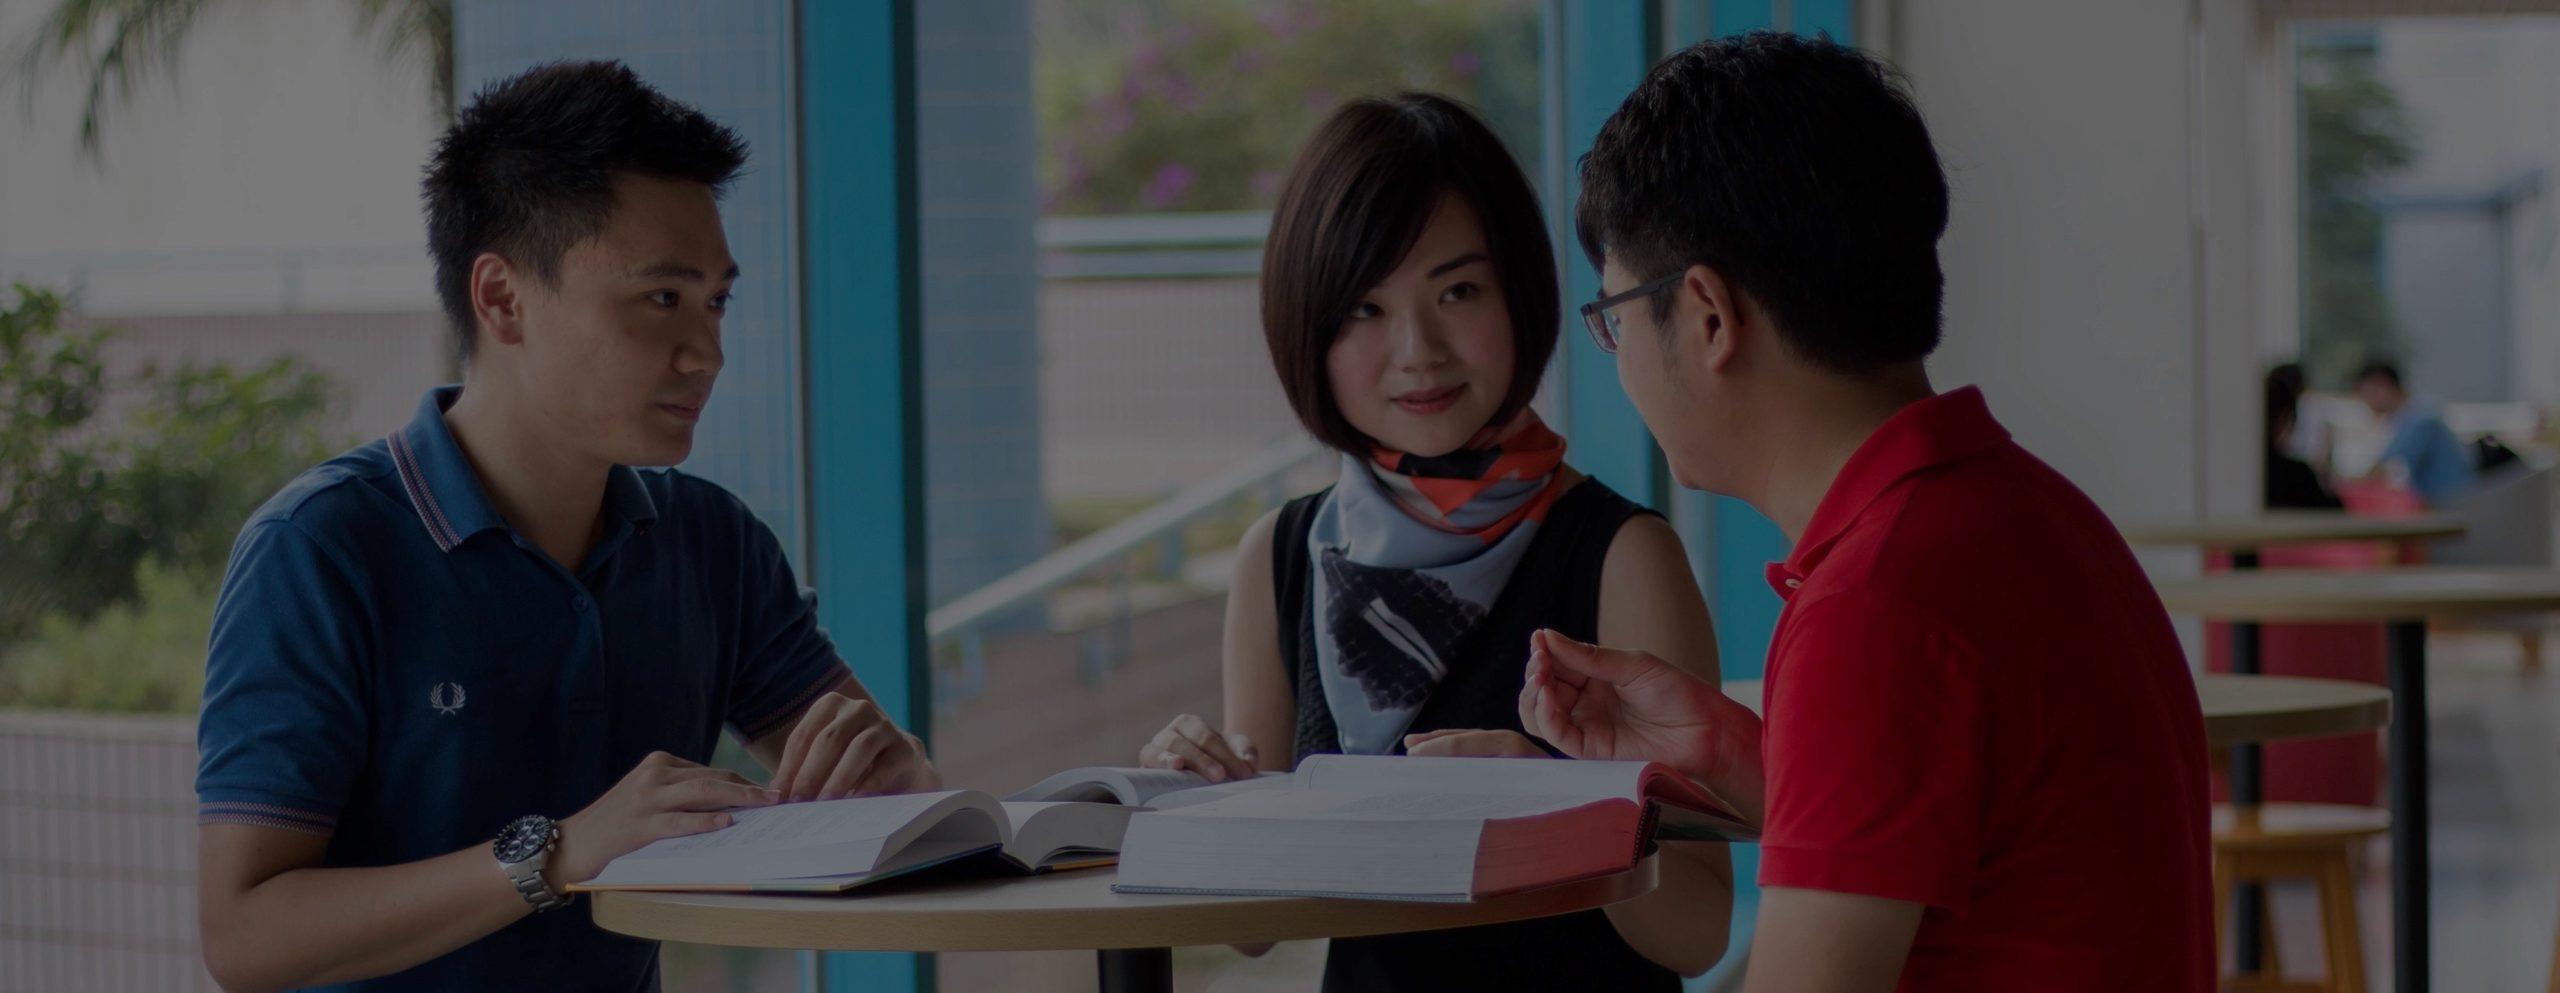 singapore tuition teacher